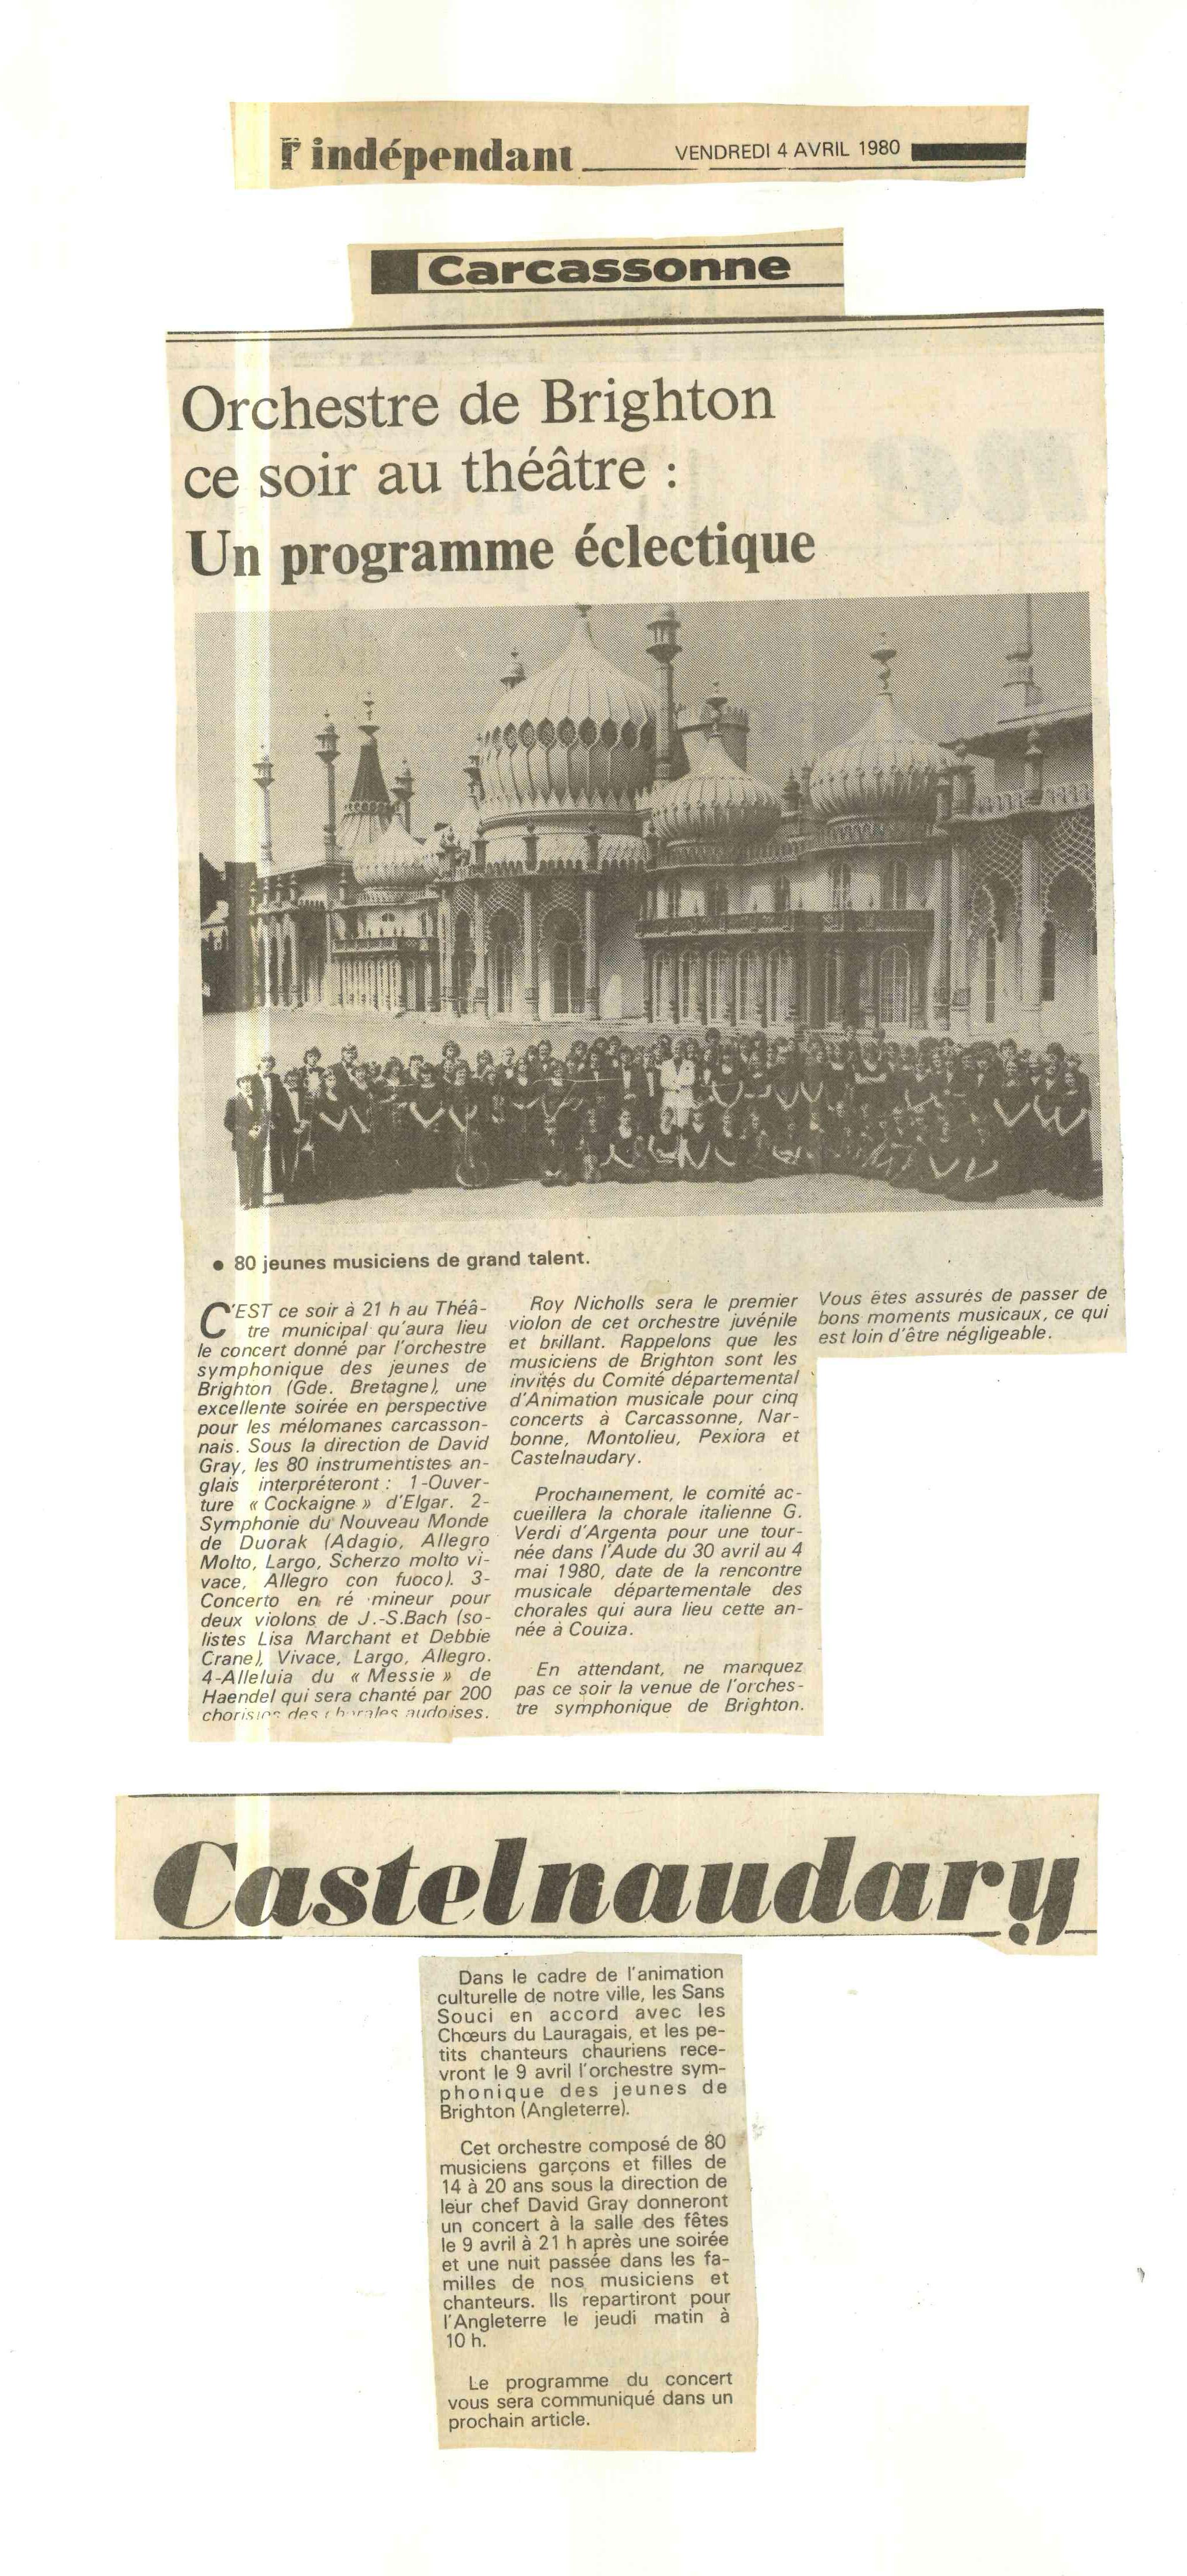 00195-L'independant, 4th April, 1980.jpg